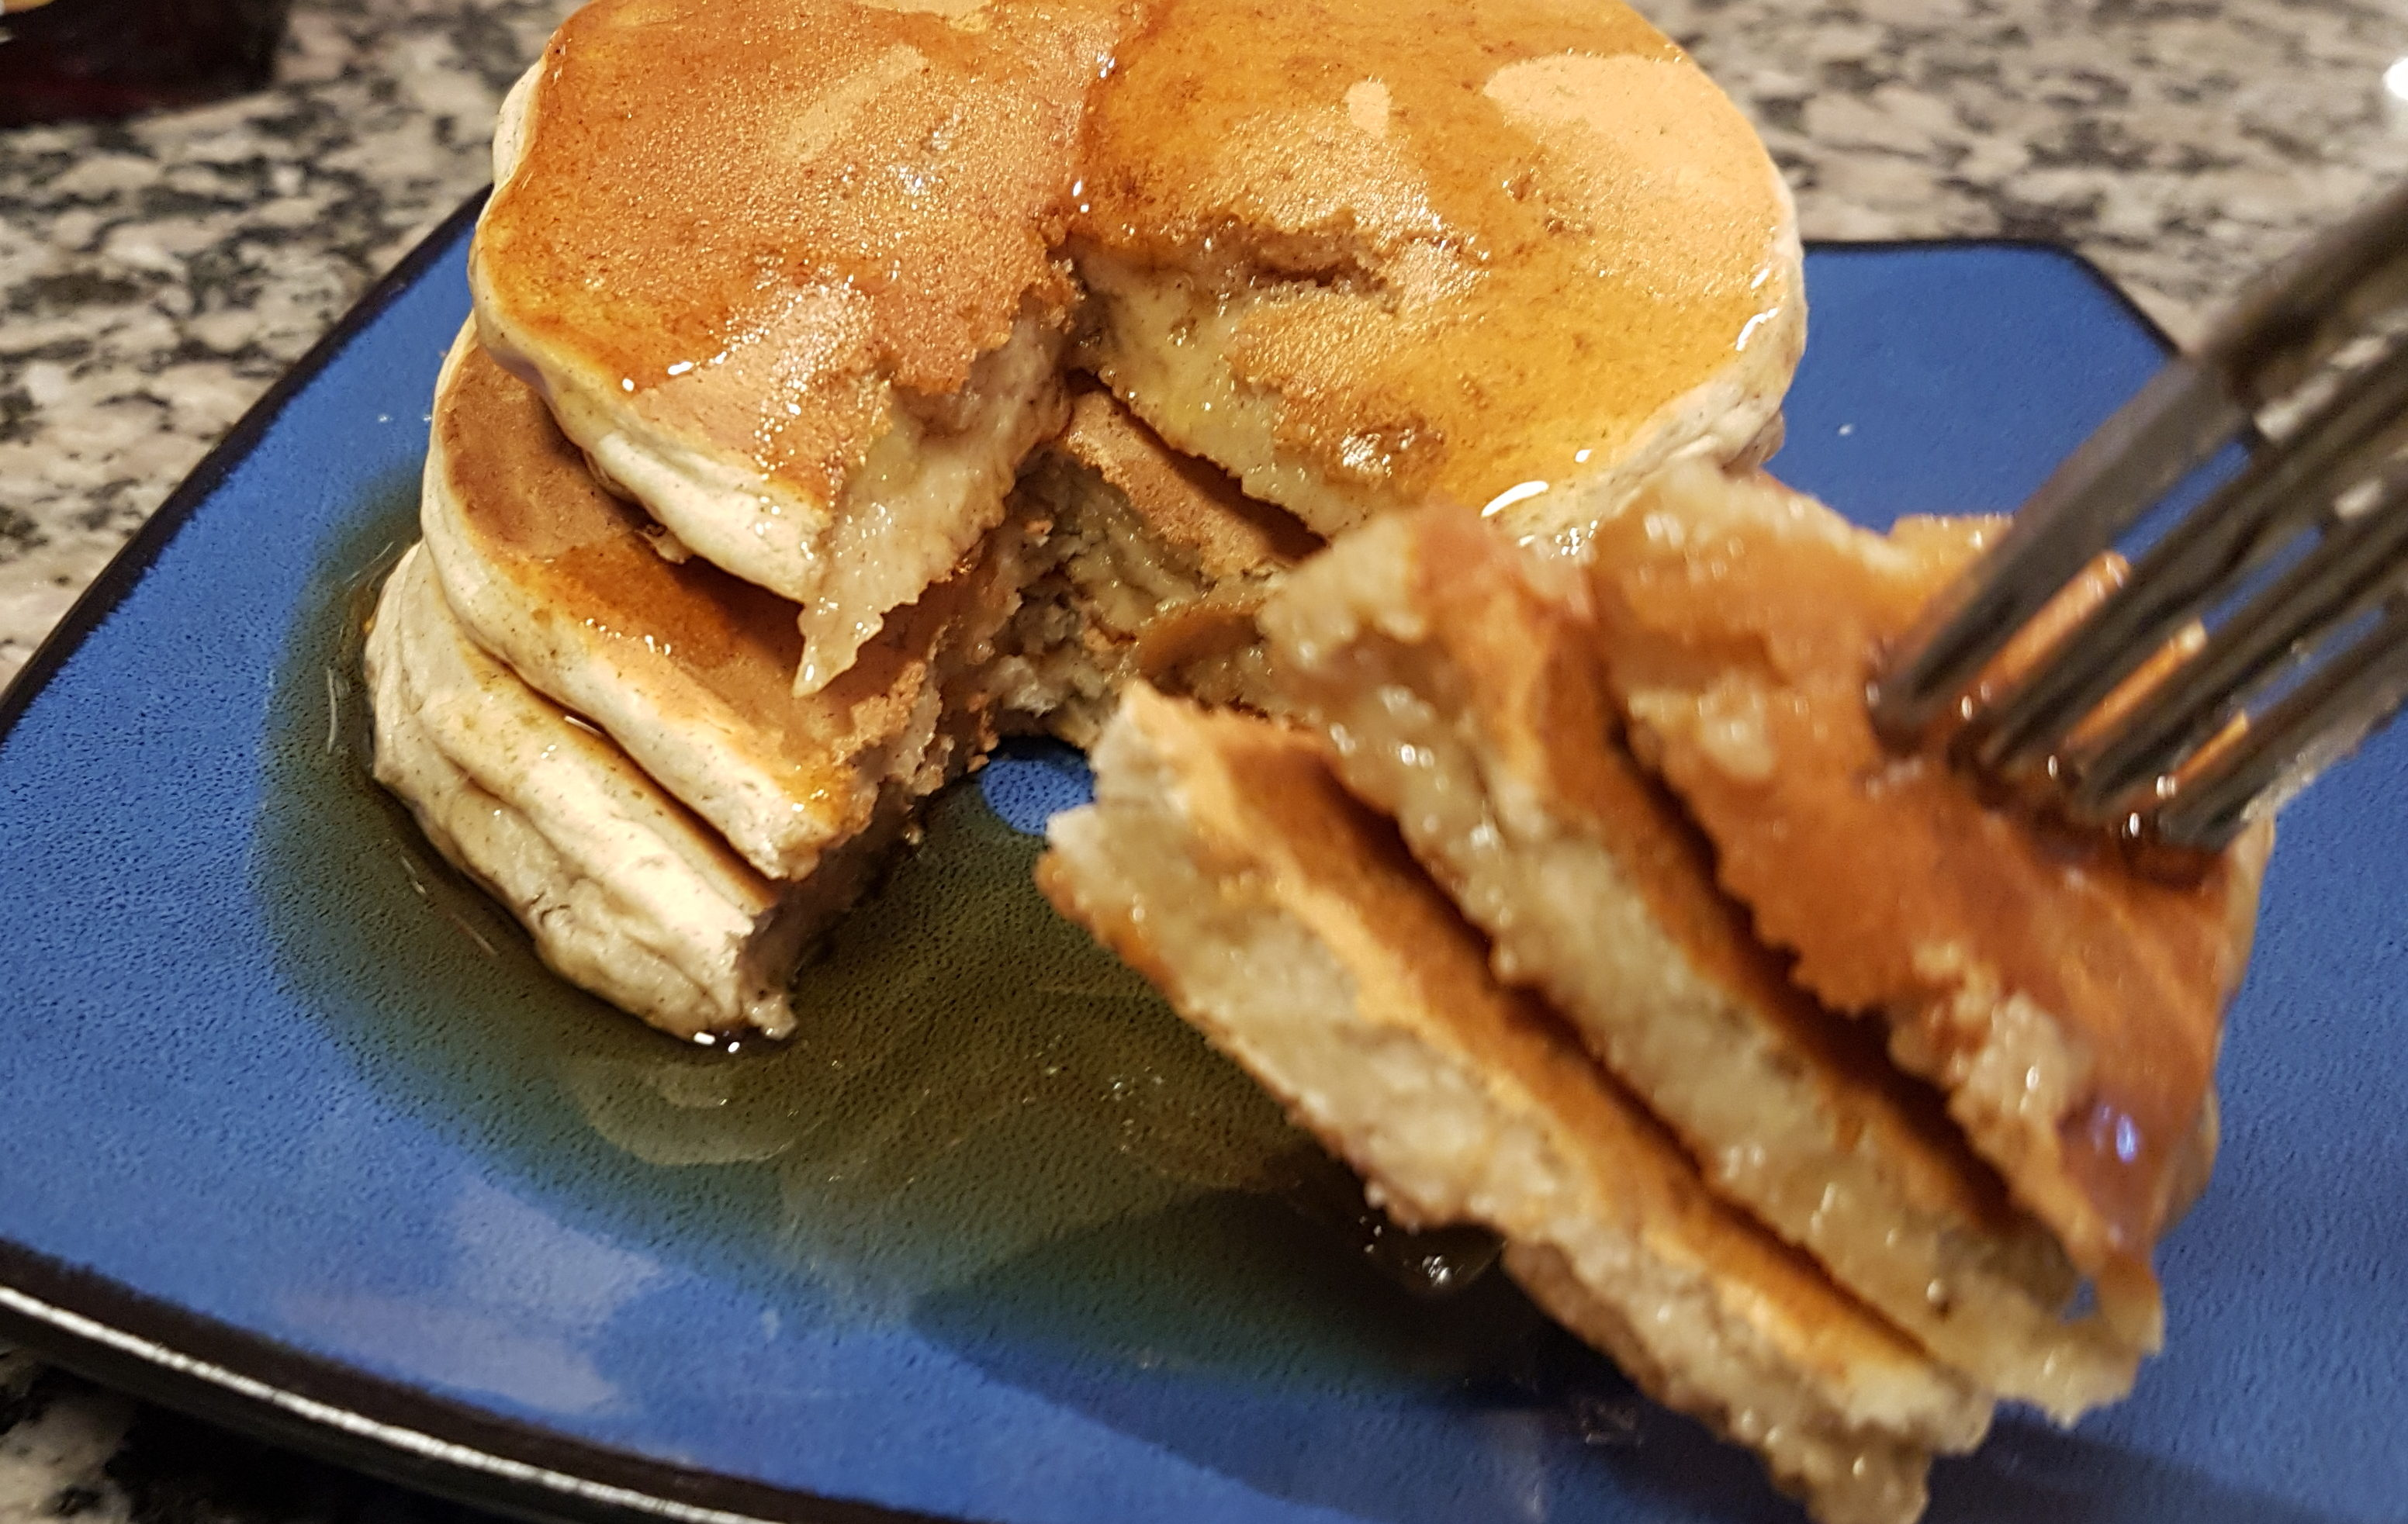 Banana and Cardamom Blender Pancakes